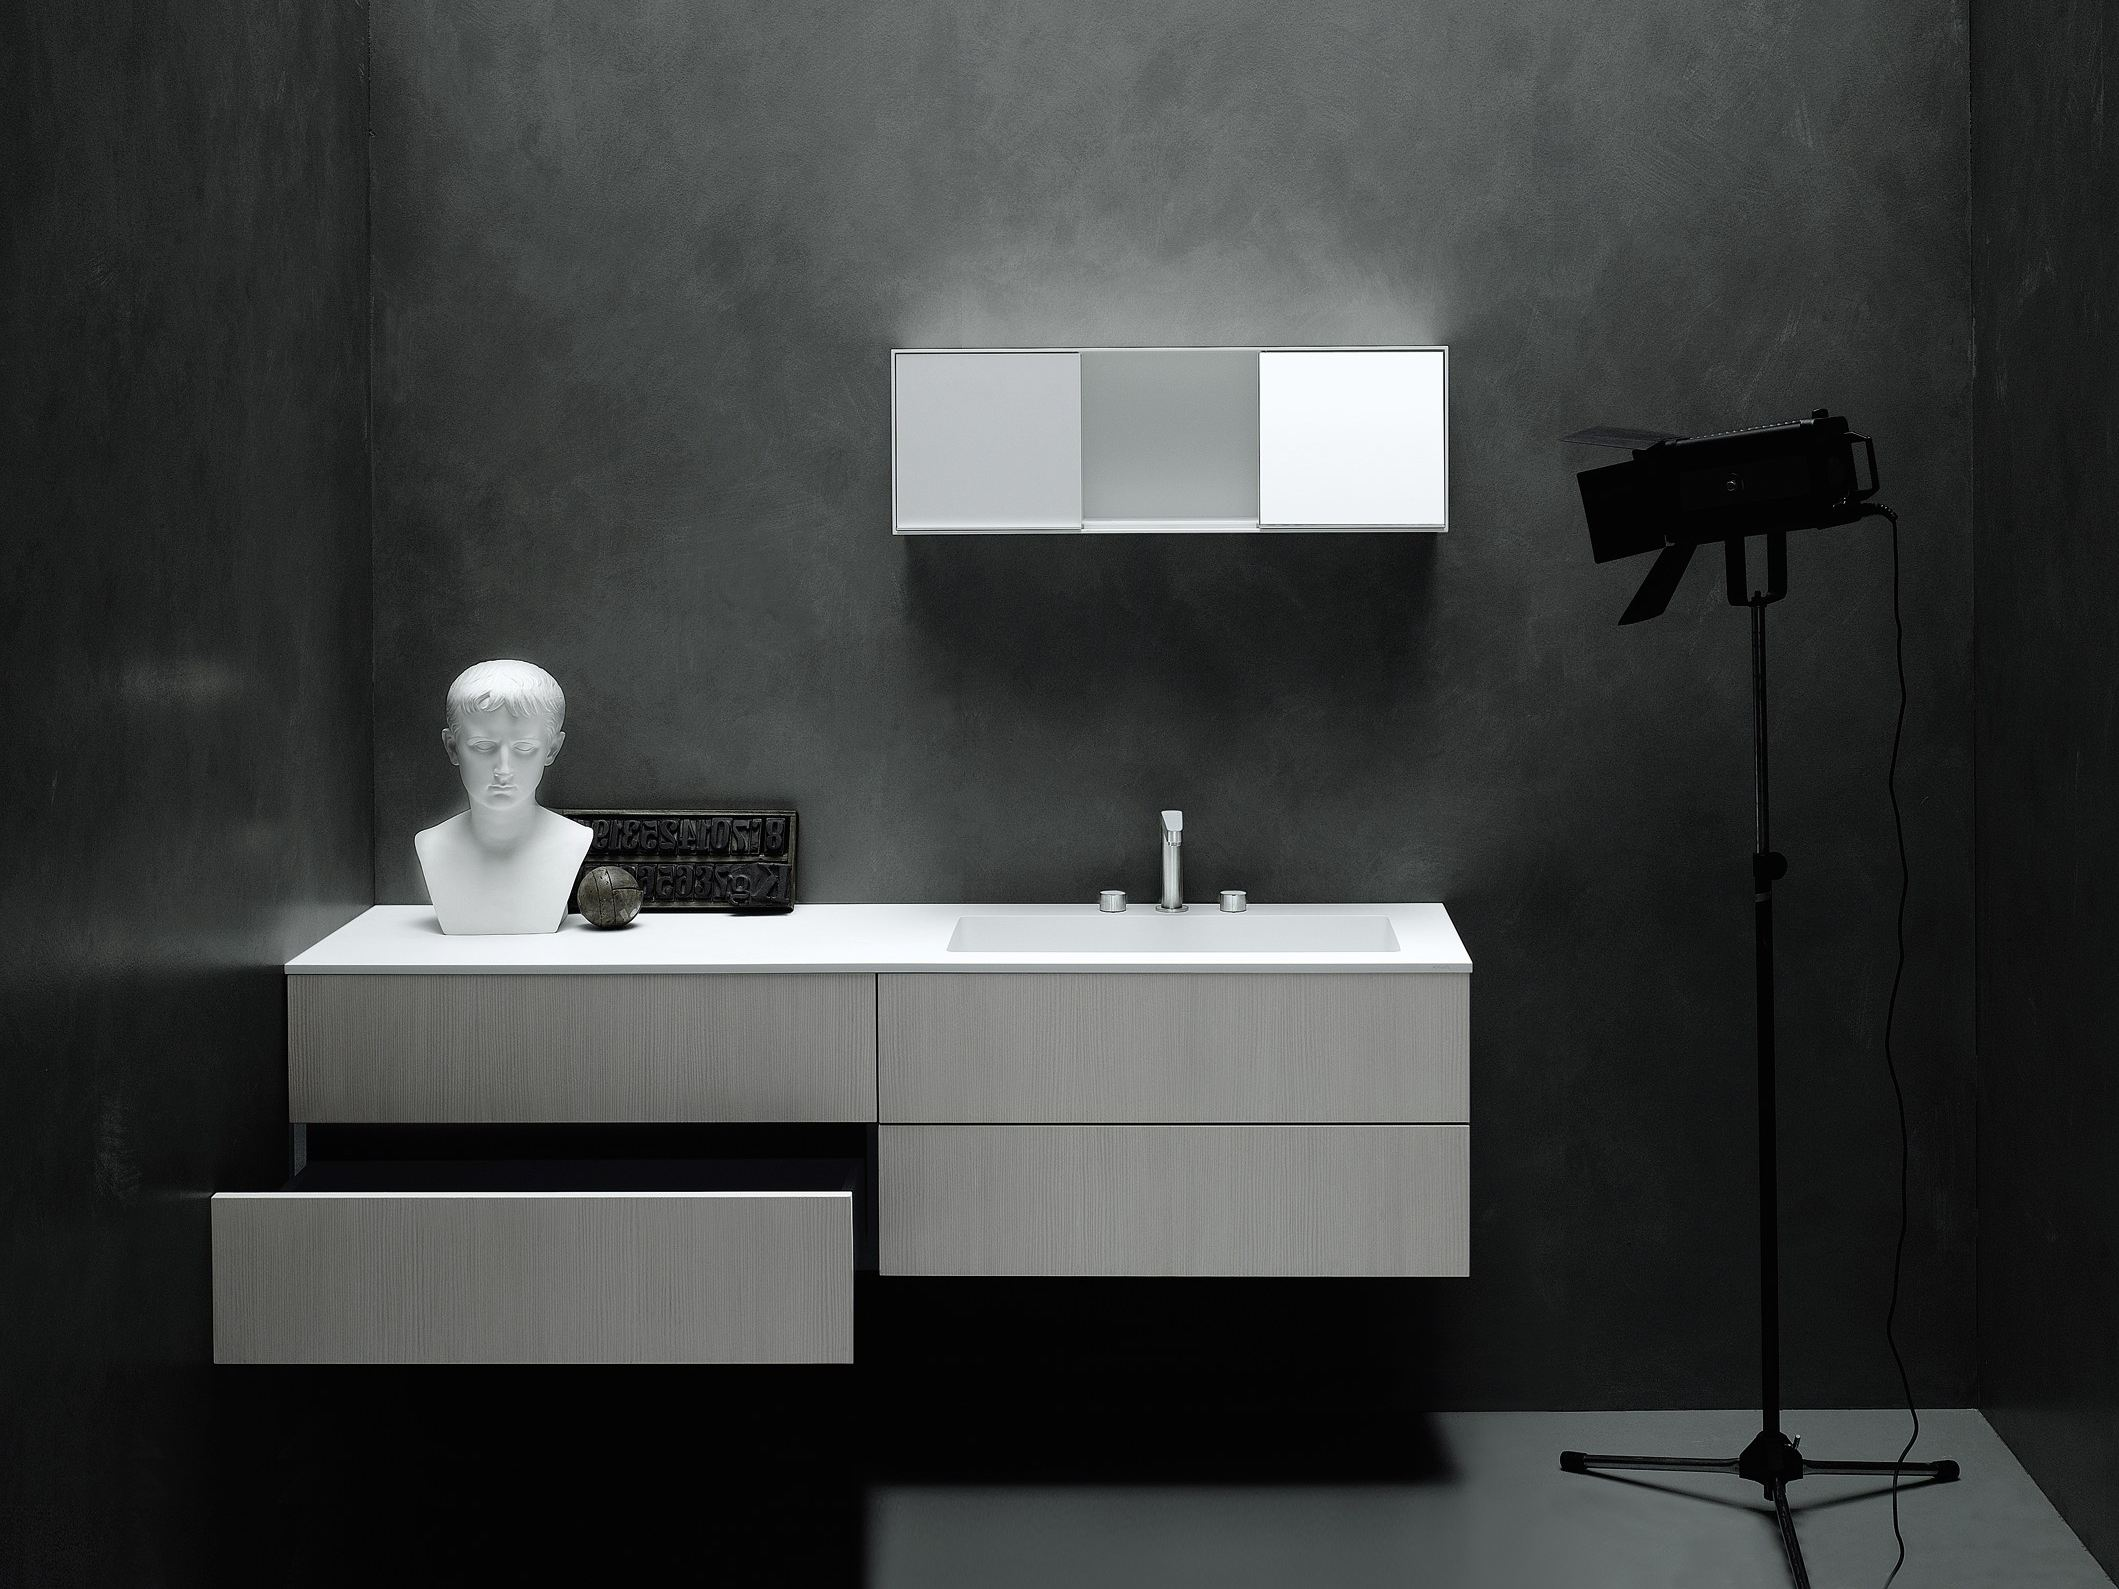 meuble sous vasque mural avec tiroirs simple by boffi. Black Bedroom Furniture Sets. Home Design Ideas